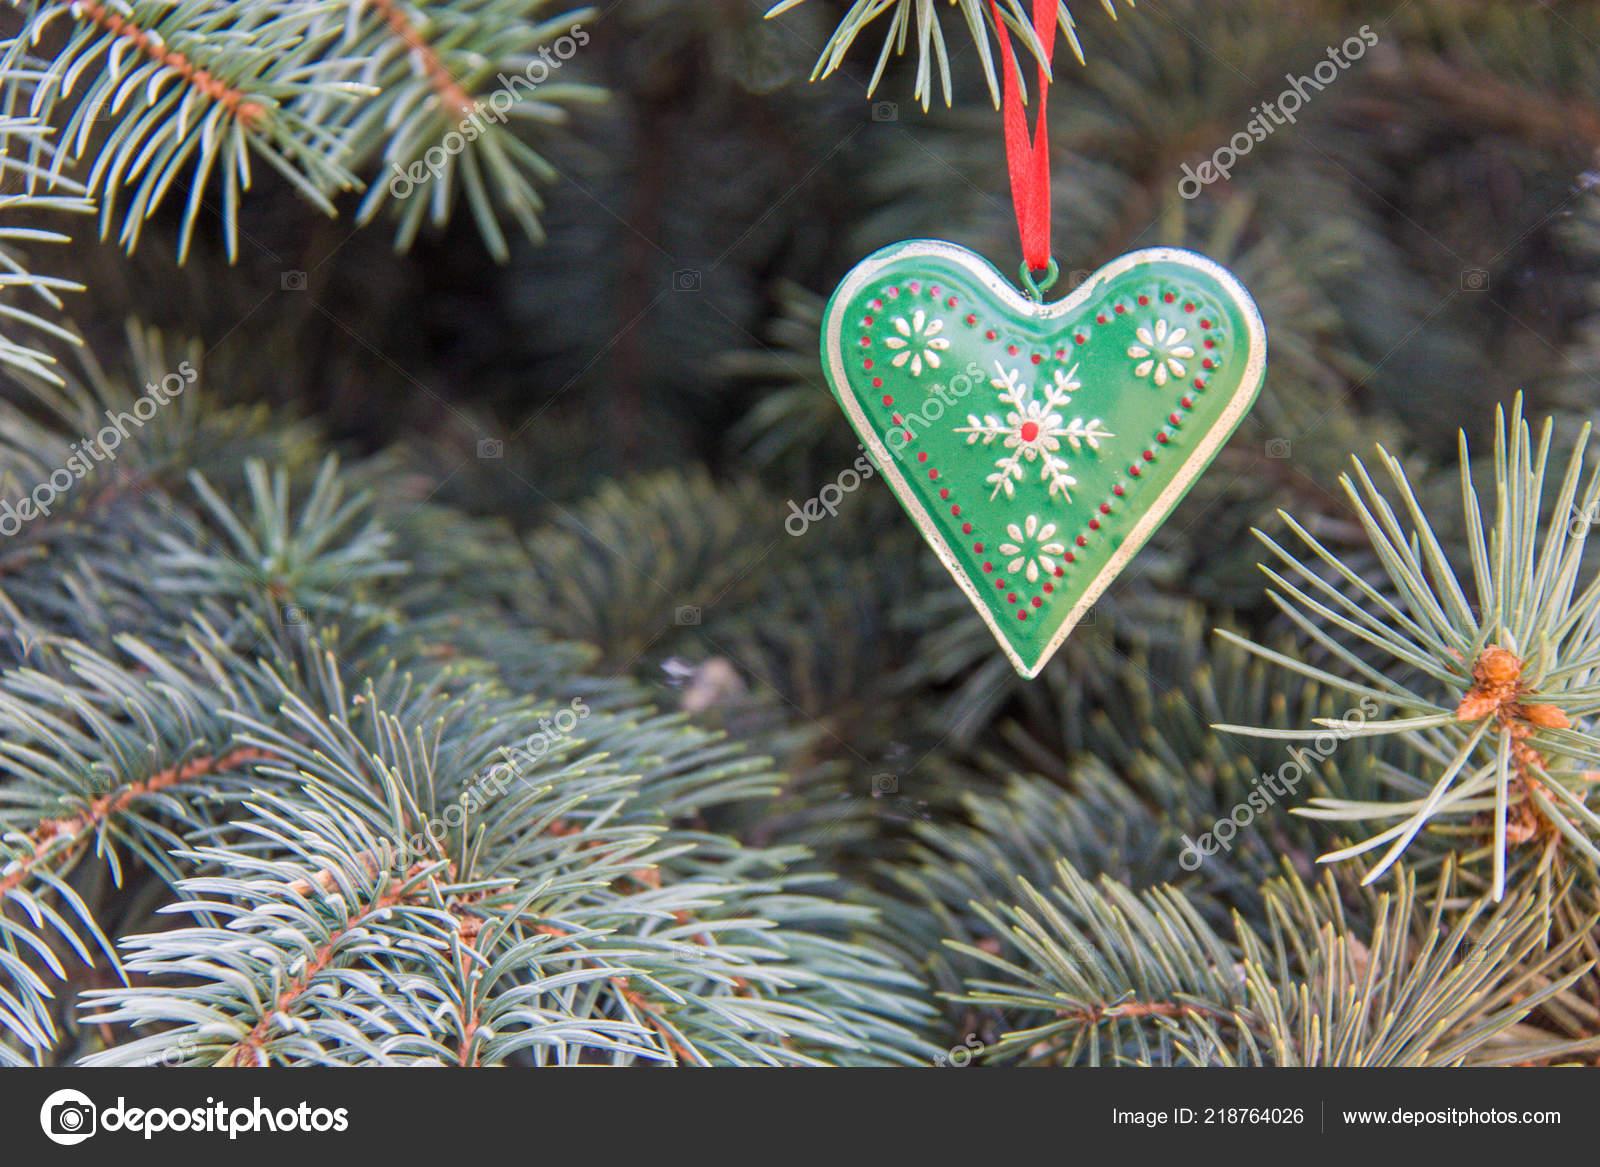 Metal Iron Decor Heart Rustic Ornaments Concept Winter Christmas New Stock Photo C Laduwki Inbox Ru 218764026